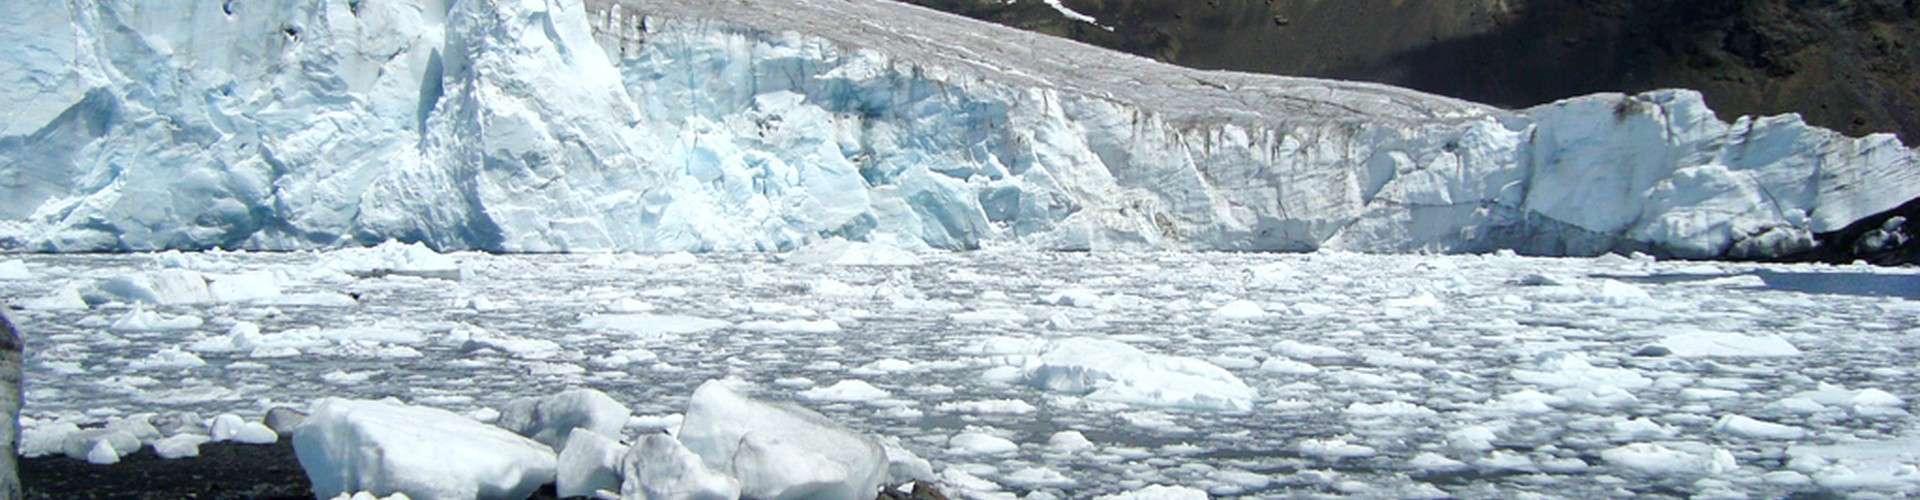 Pastoruri Glacier (Credit: Edubucher/Wikimedia Commons)